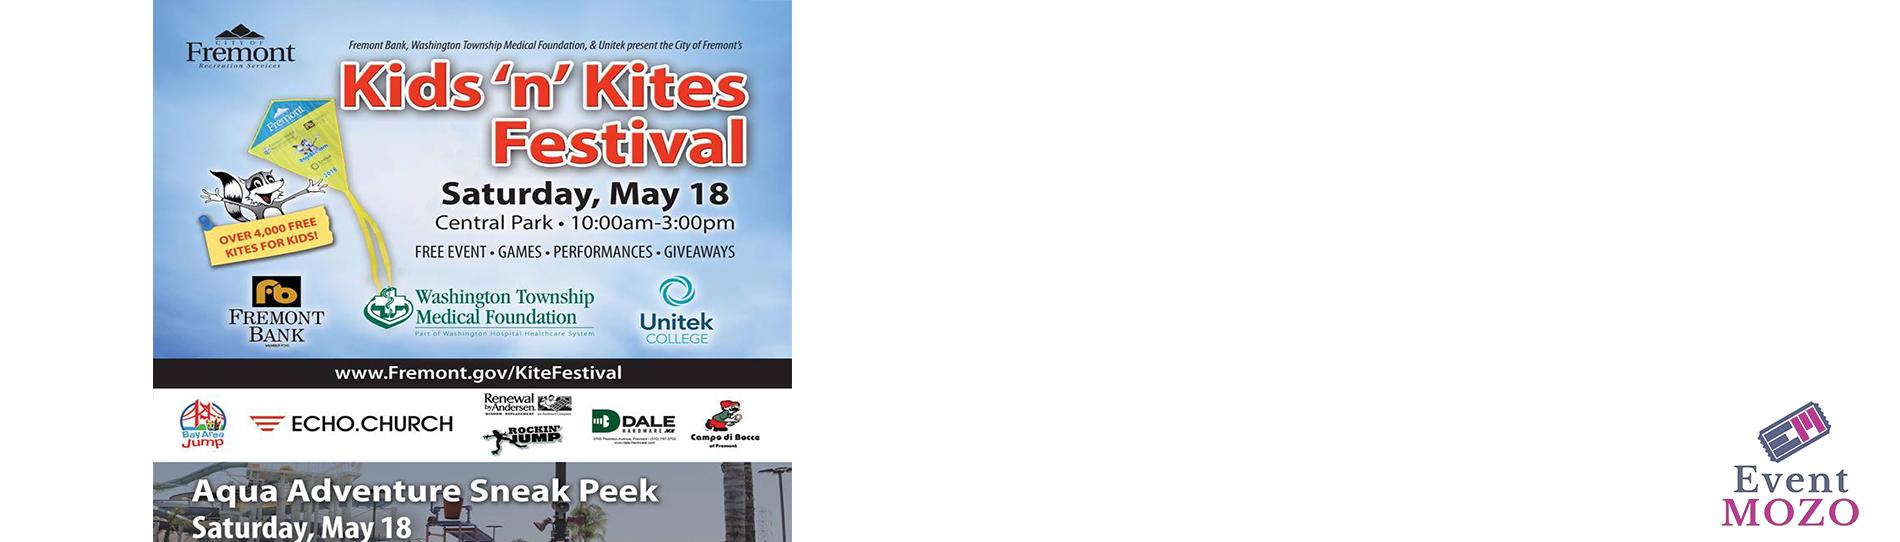 EventMozo Kids 'n' Kites Festival